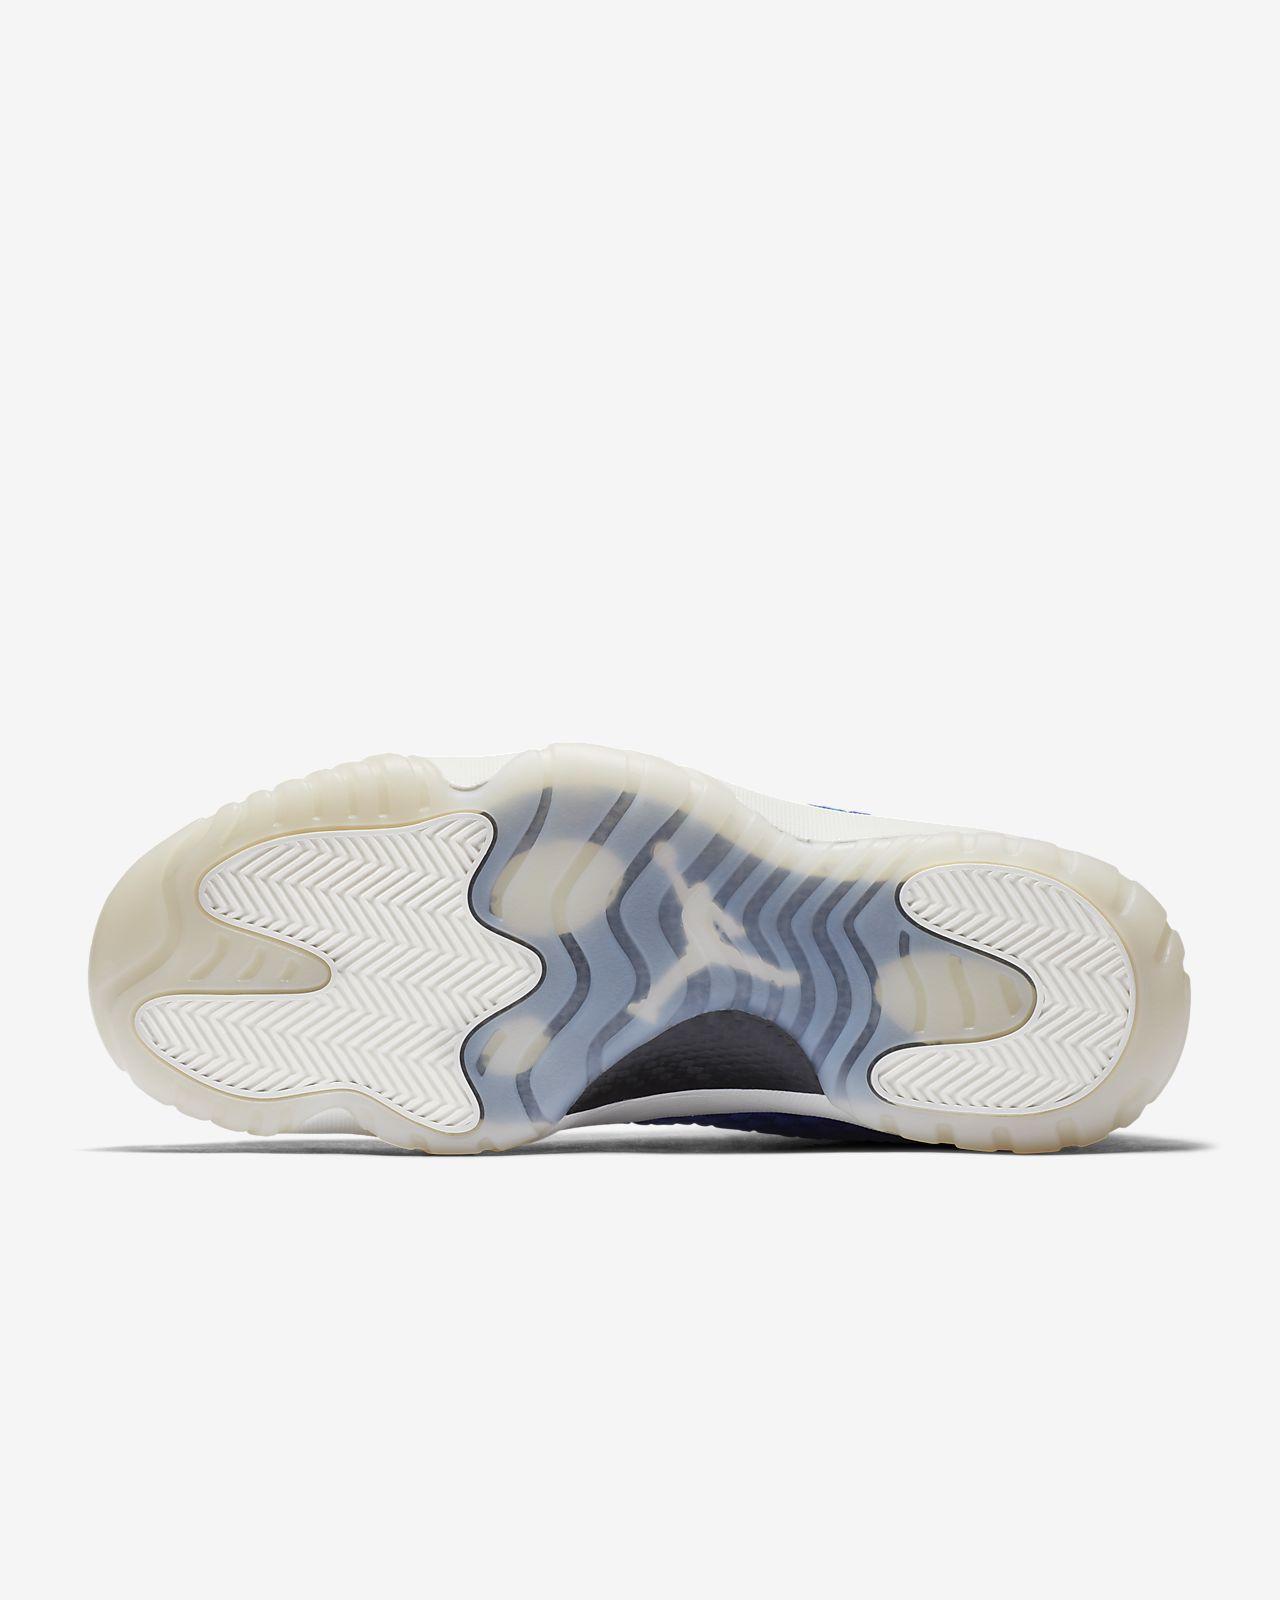 NIKE AIR JORDAN FUTURE LOW Sneaker Herren Herrenschuhe